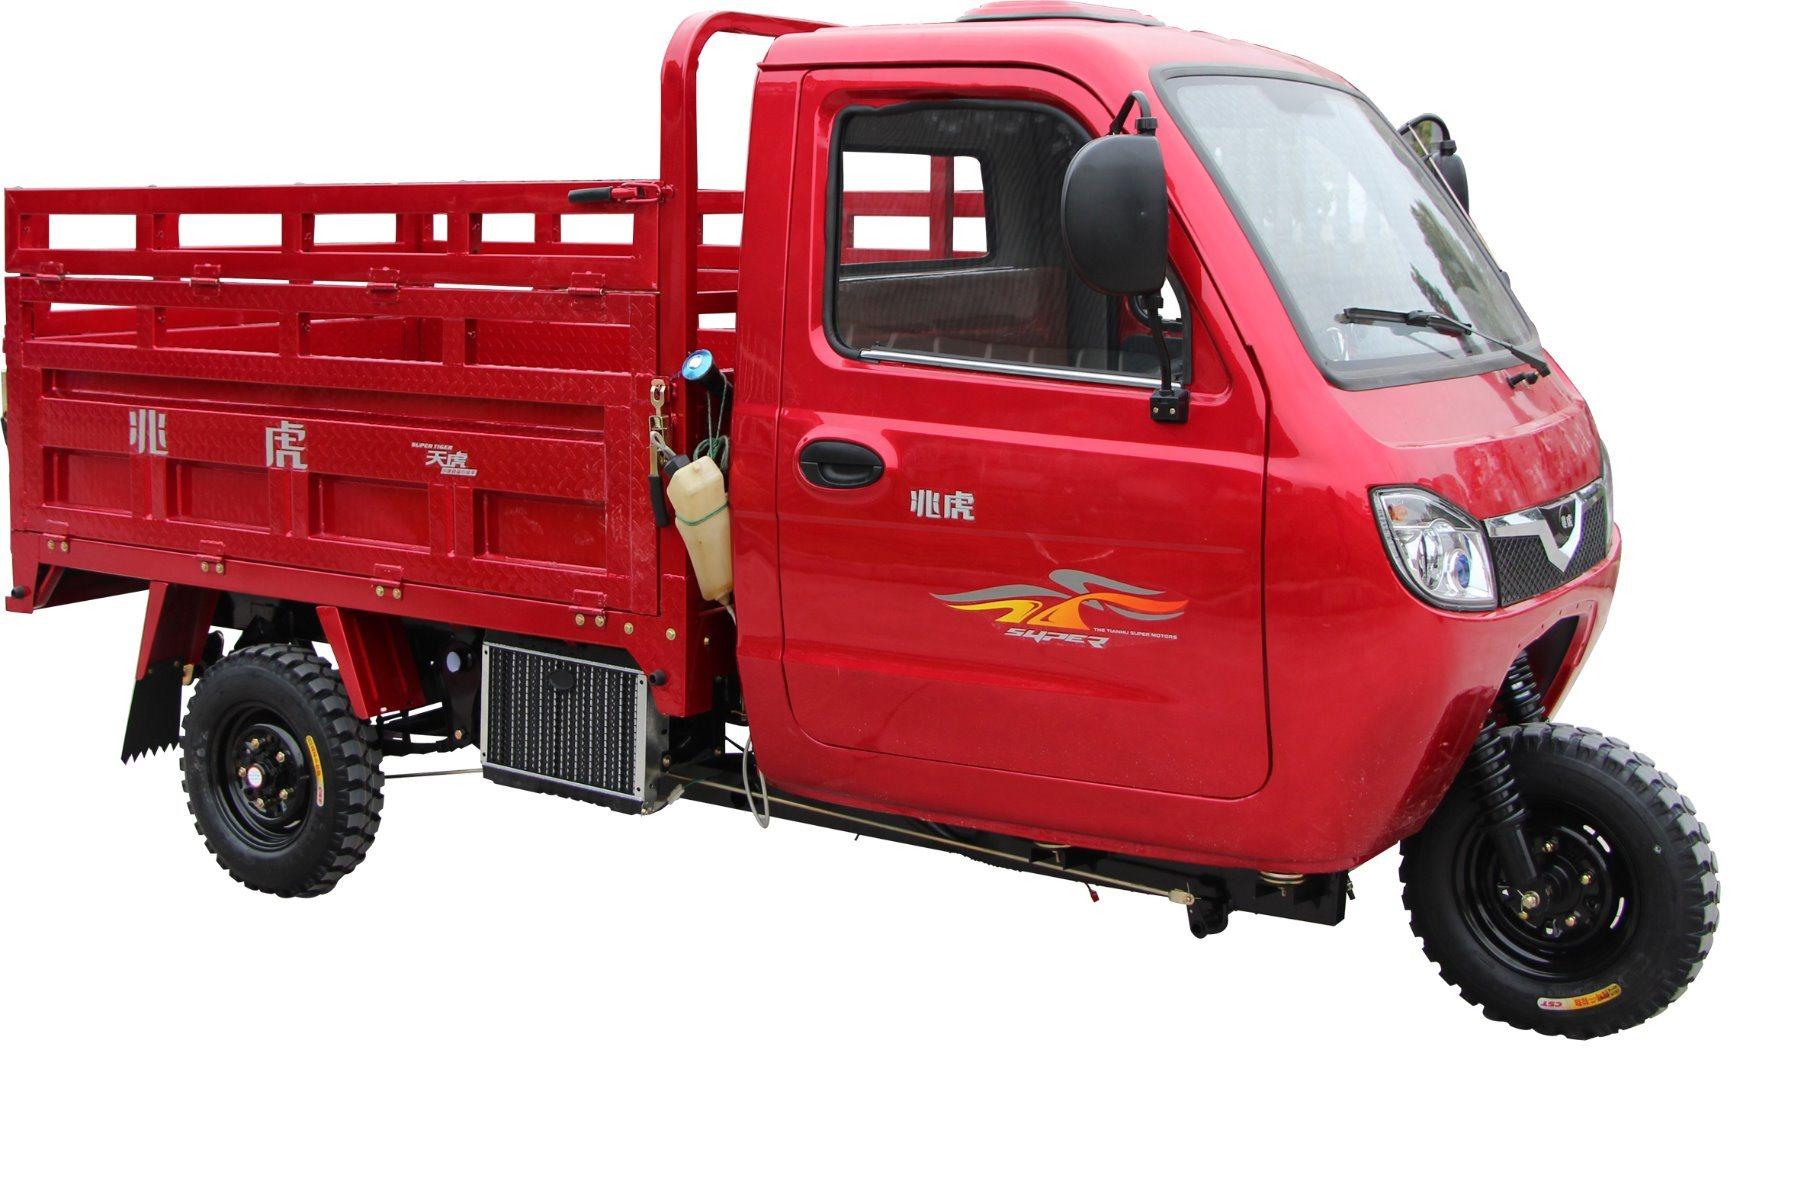 200cc Cargo, Driver′s Room